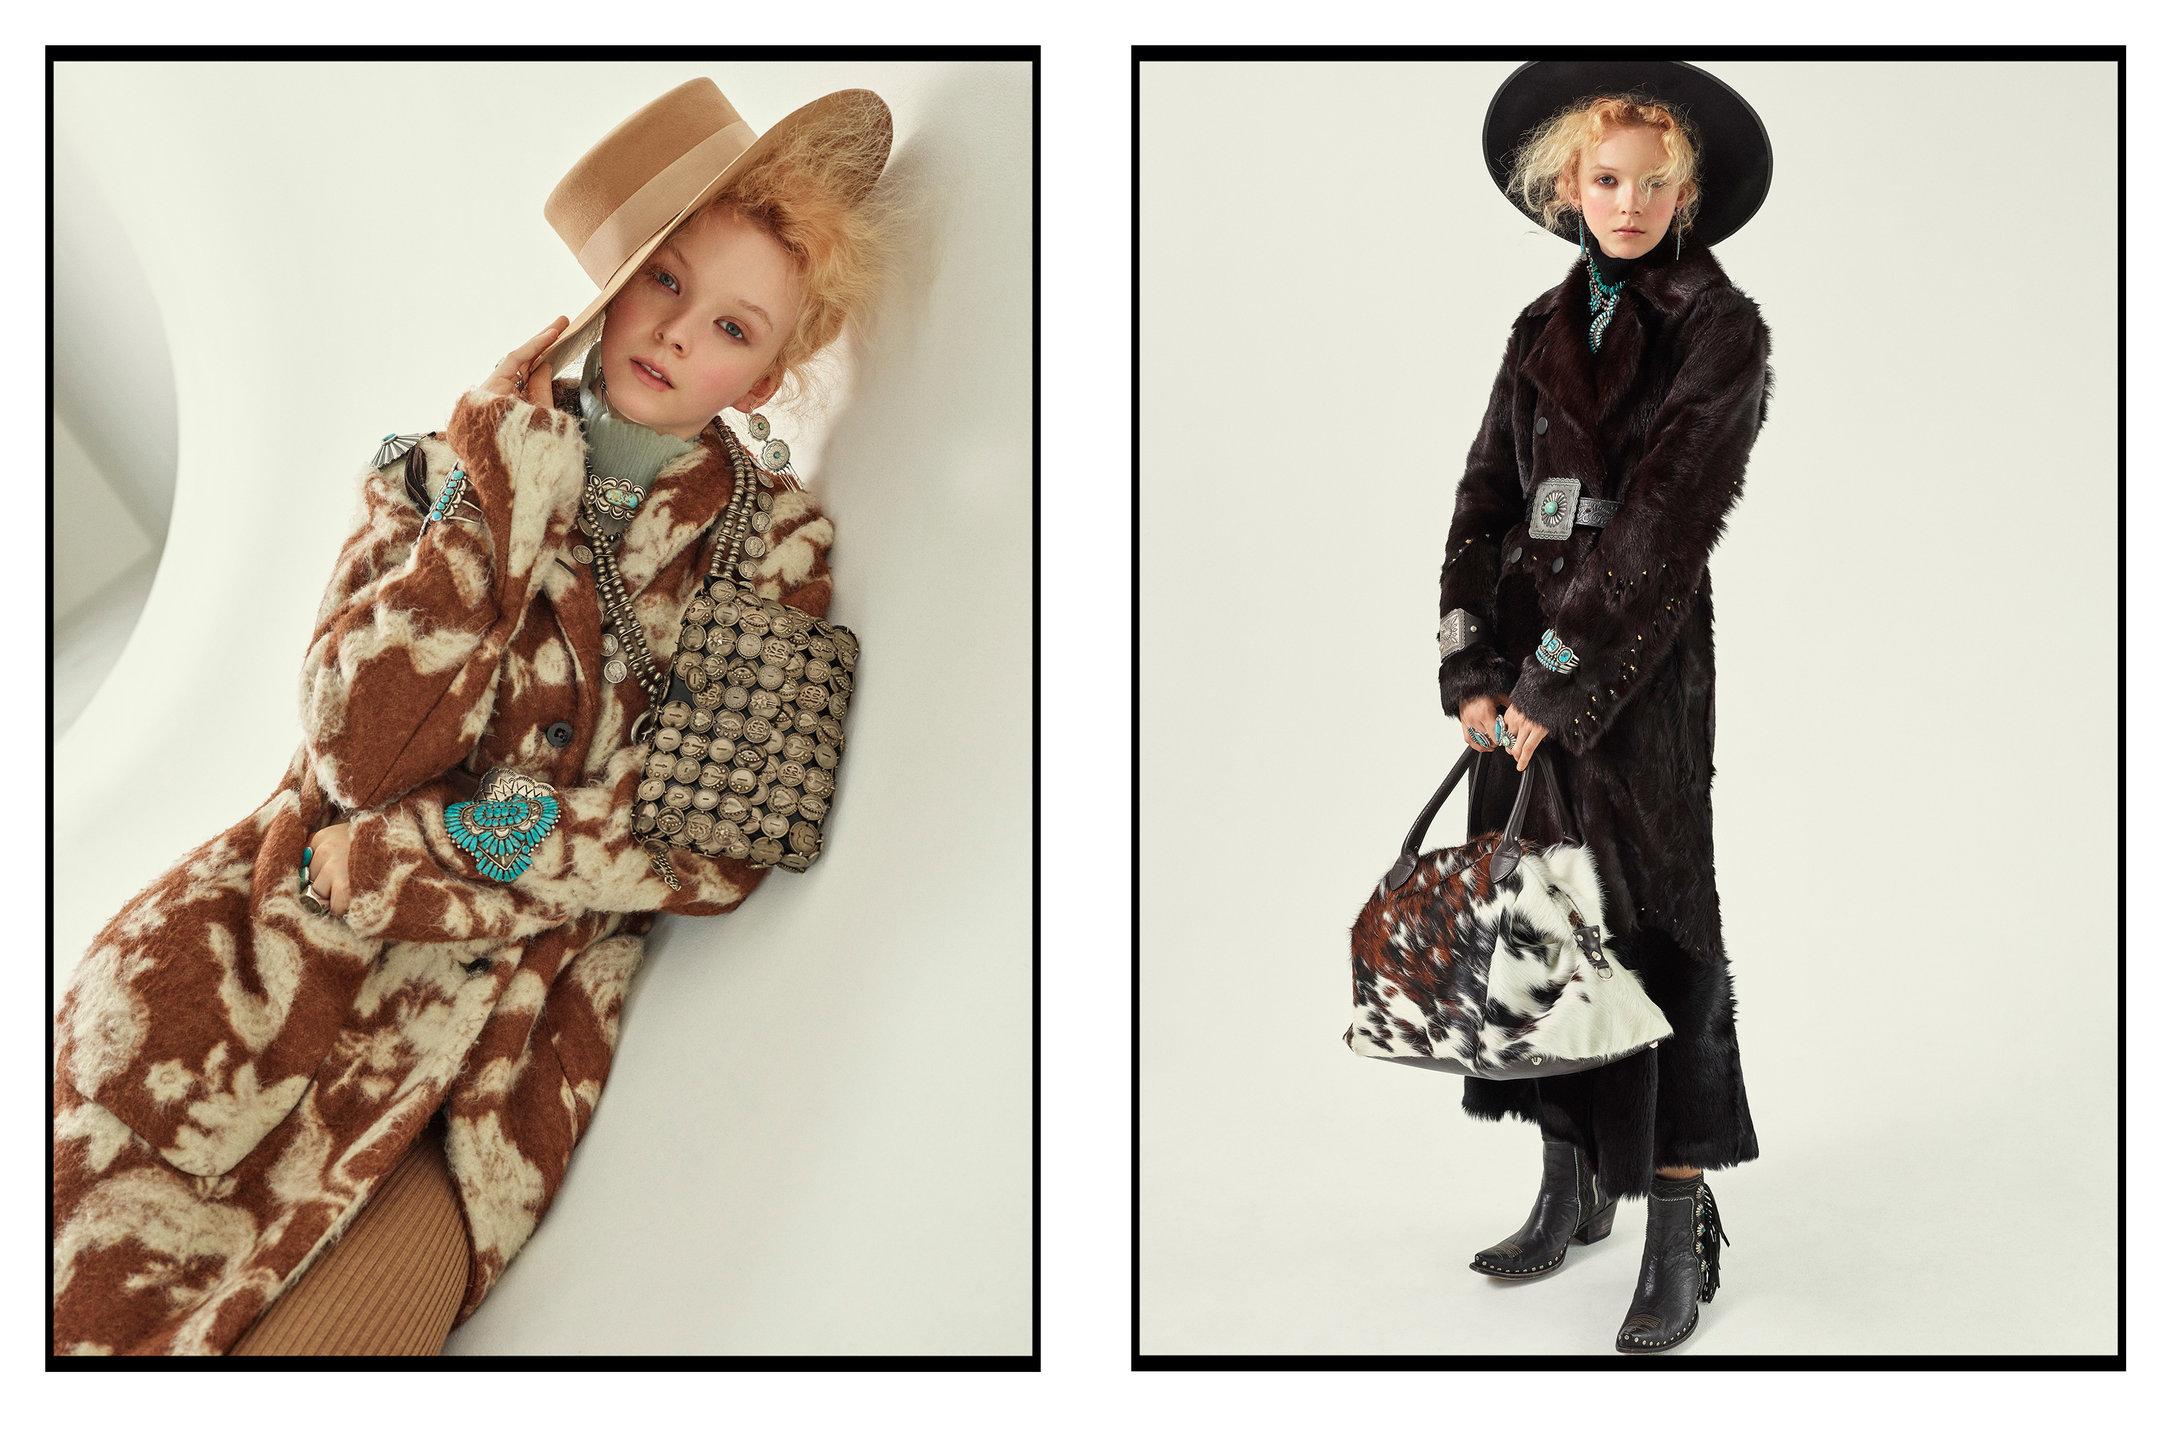 Vogue Japan. Lily Nova. January, 2019.